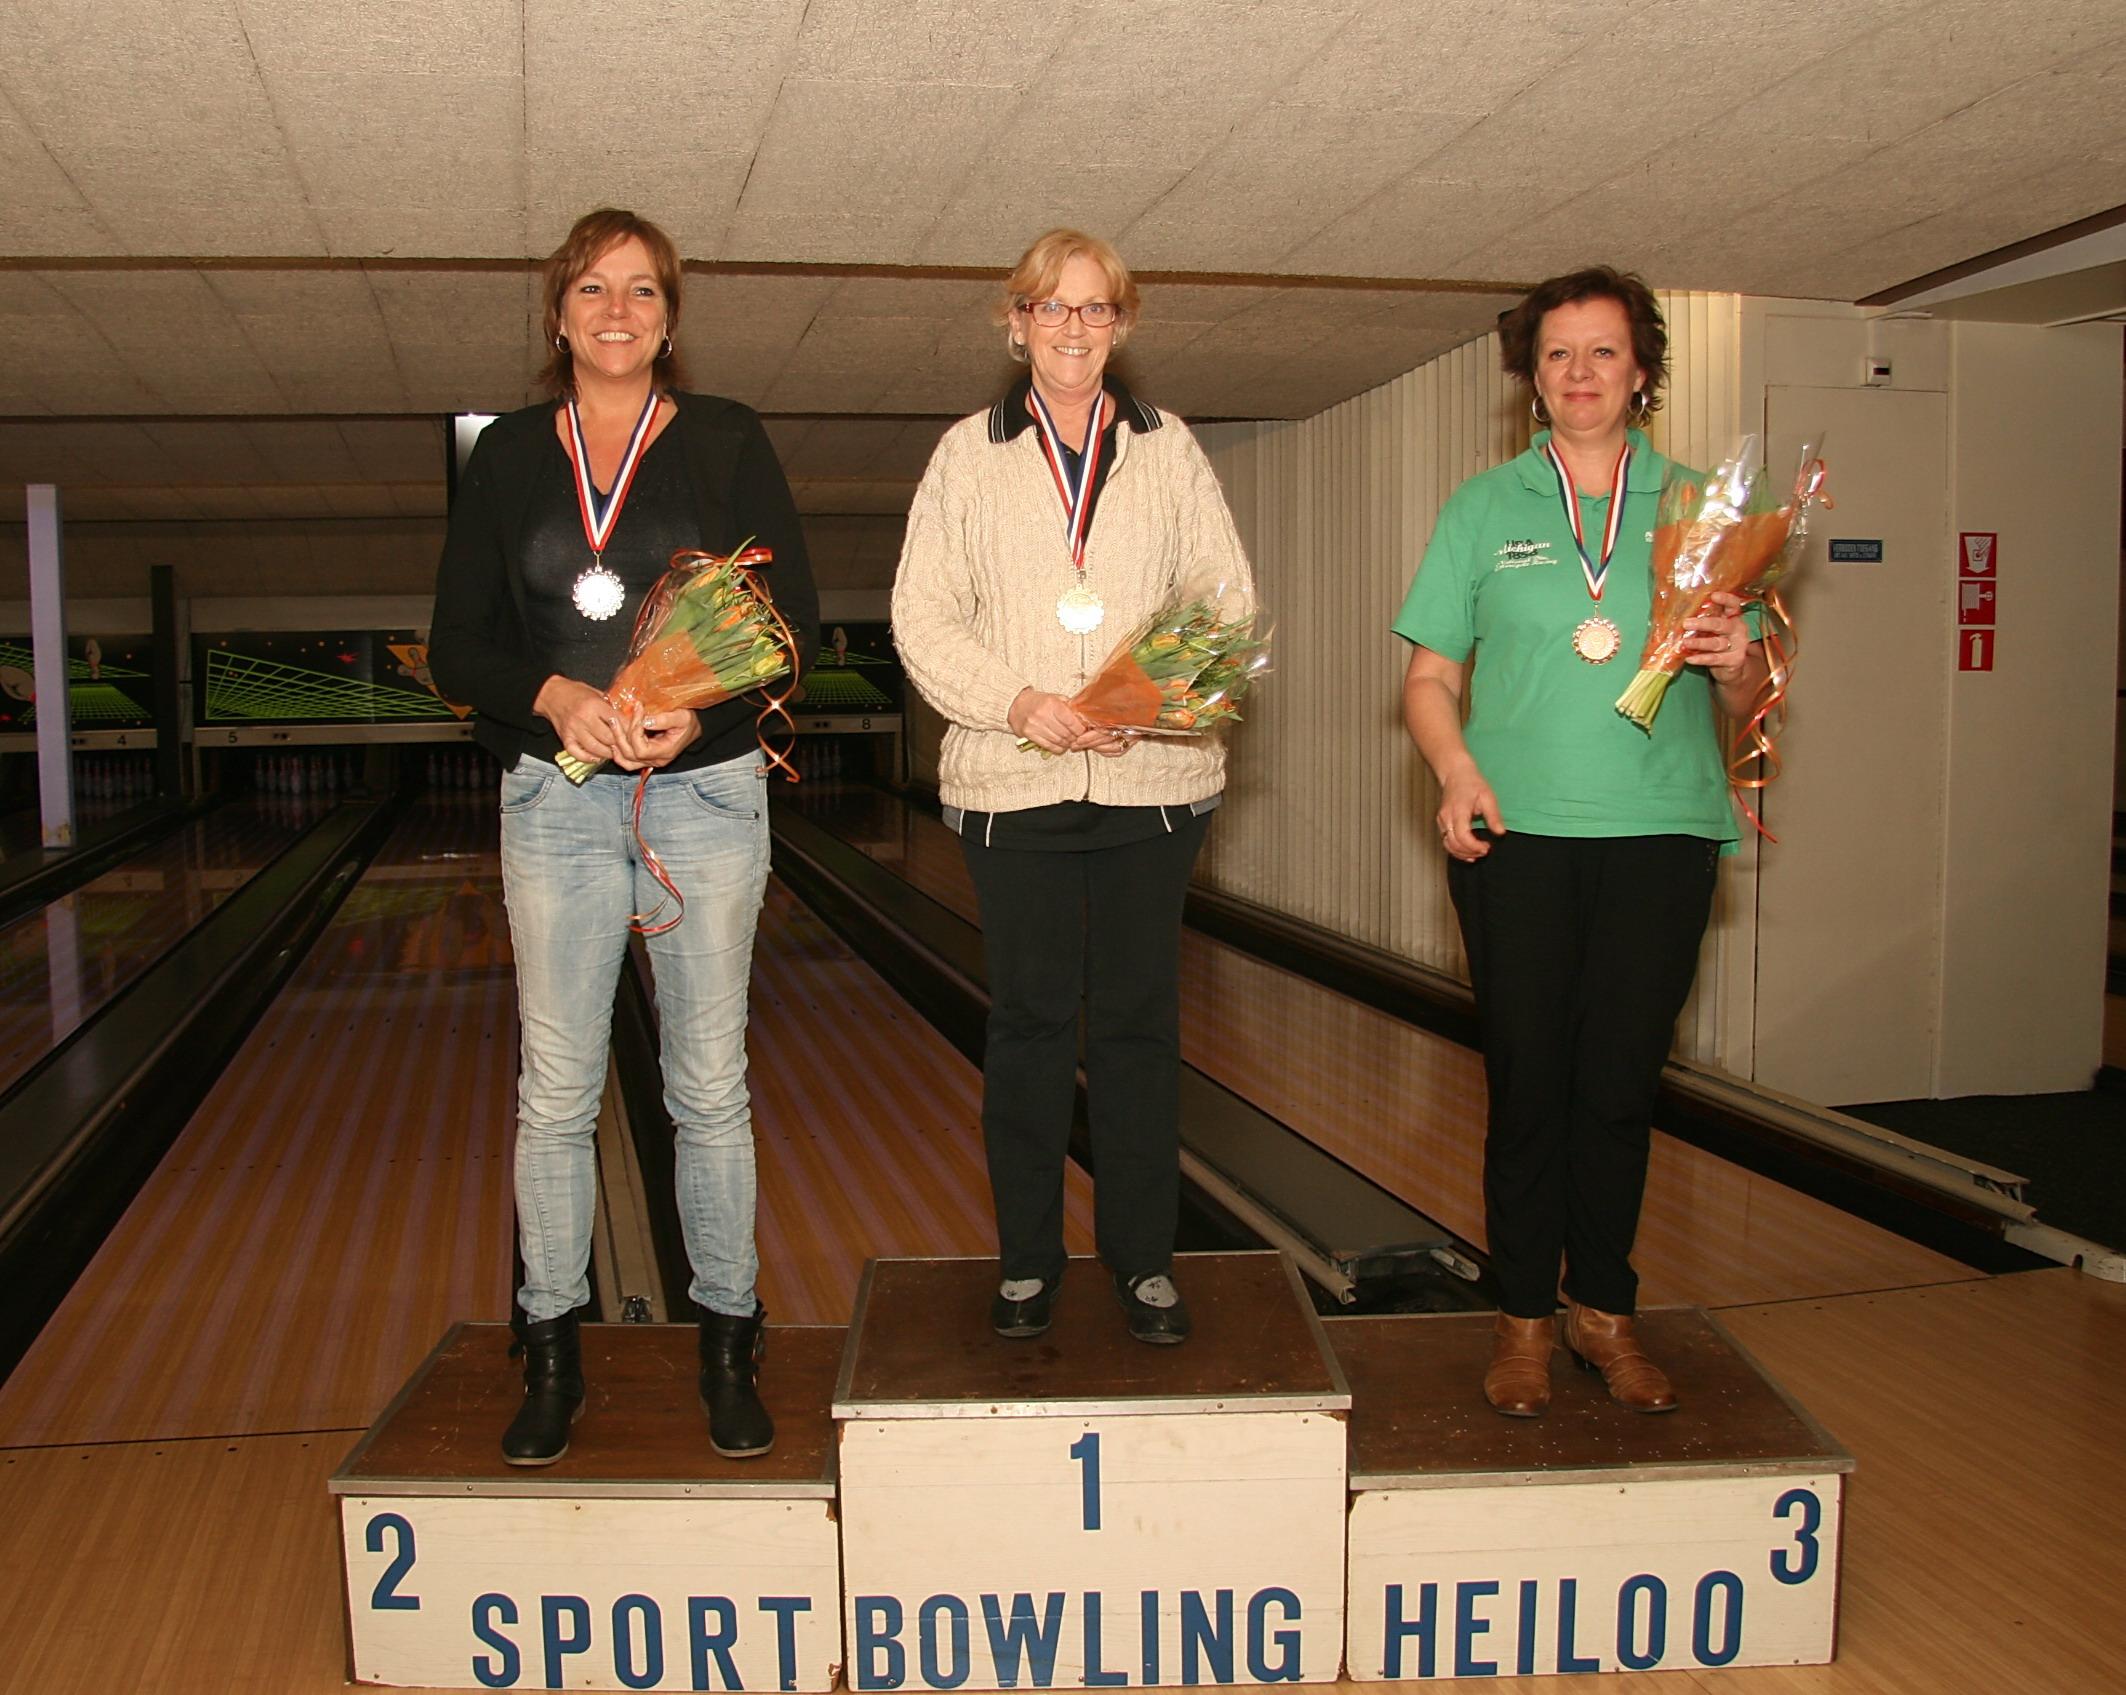 http://www.bowlingverenigingheiloo.nl/fotos_verhalen/foto's/2013_0214-Ver.kamp-Dames-B.jpg